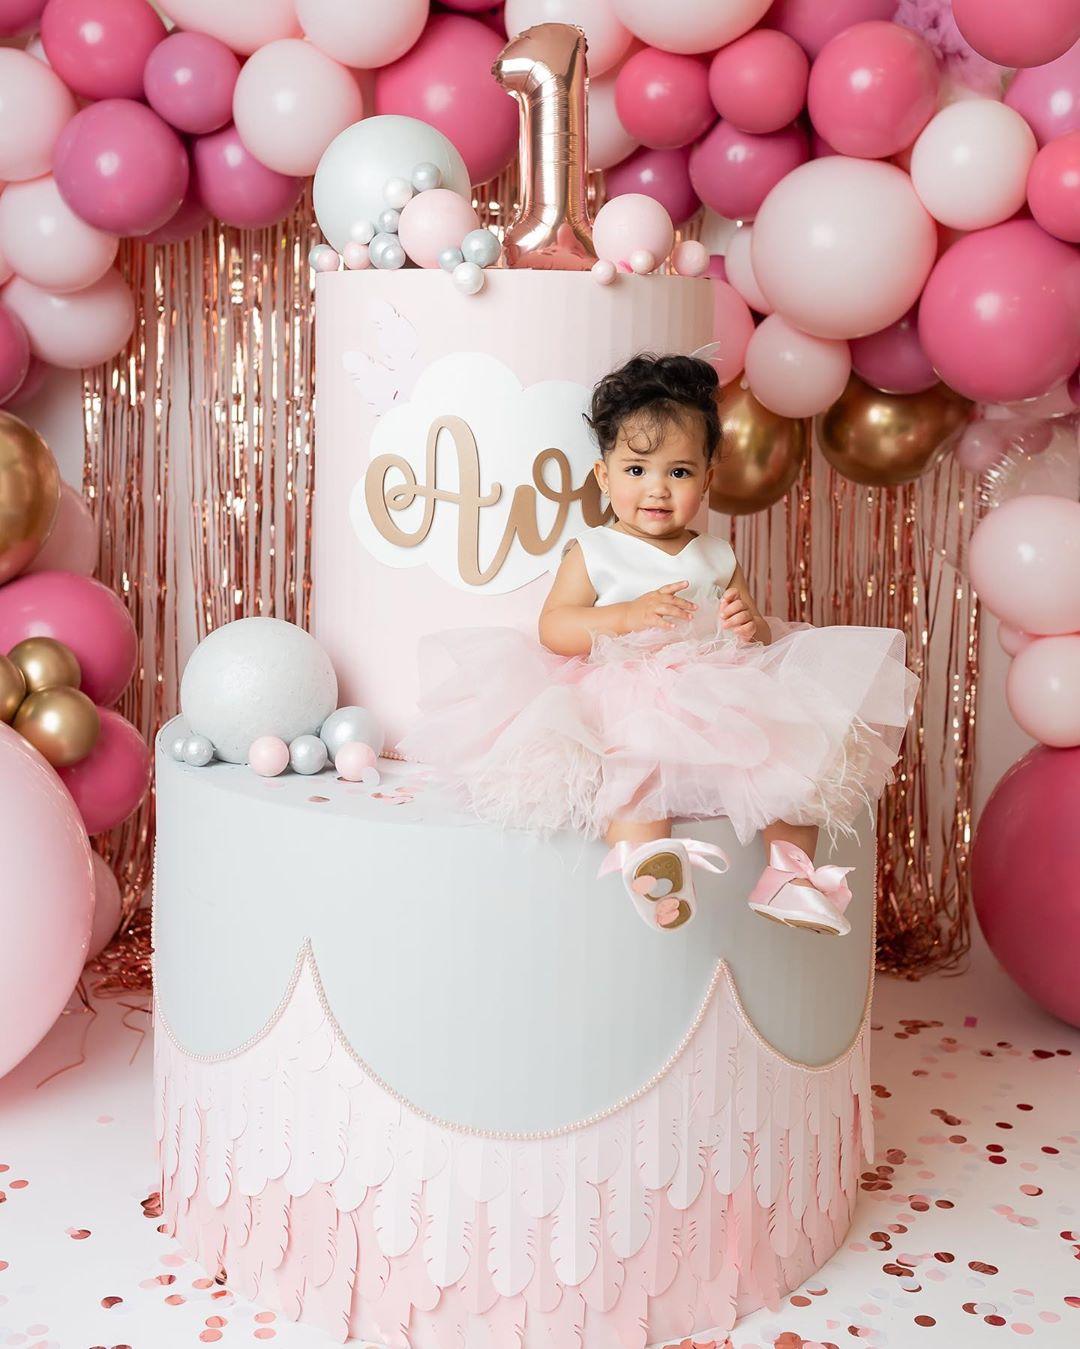 fiesta de niña 1 año decoracion